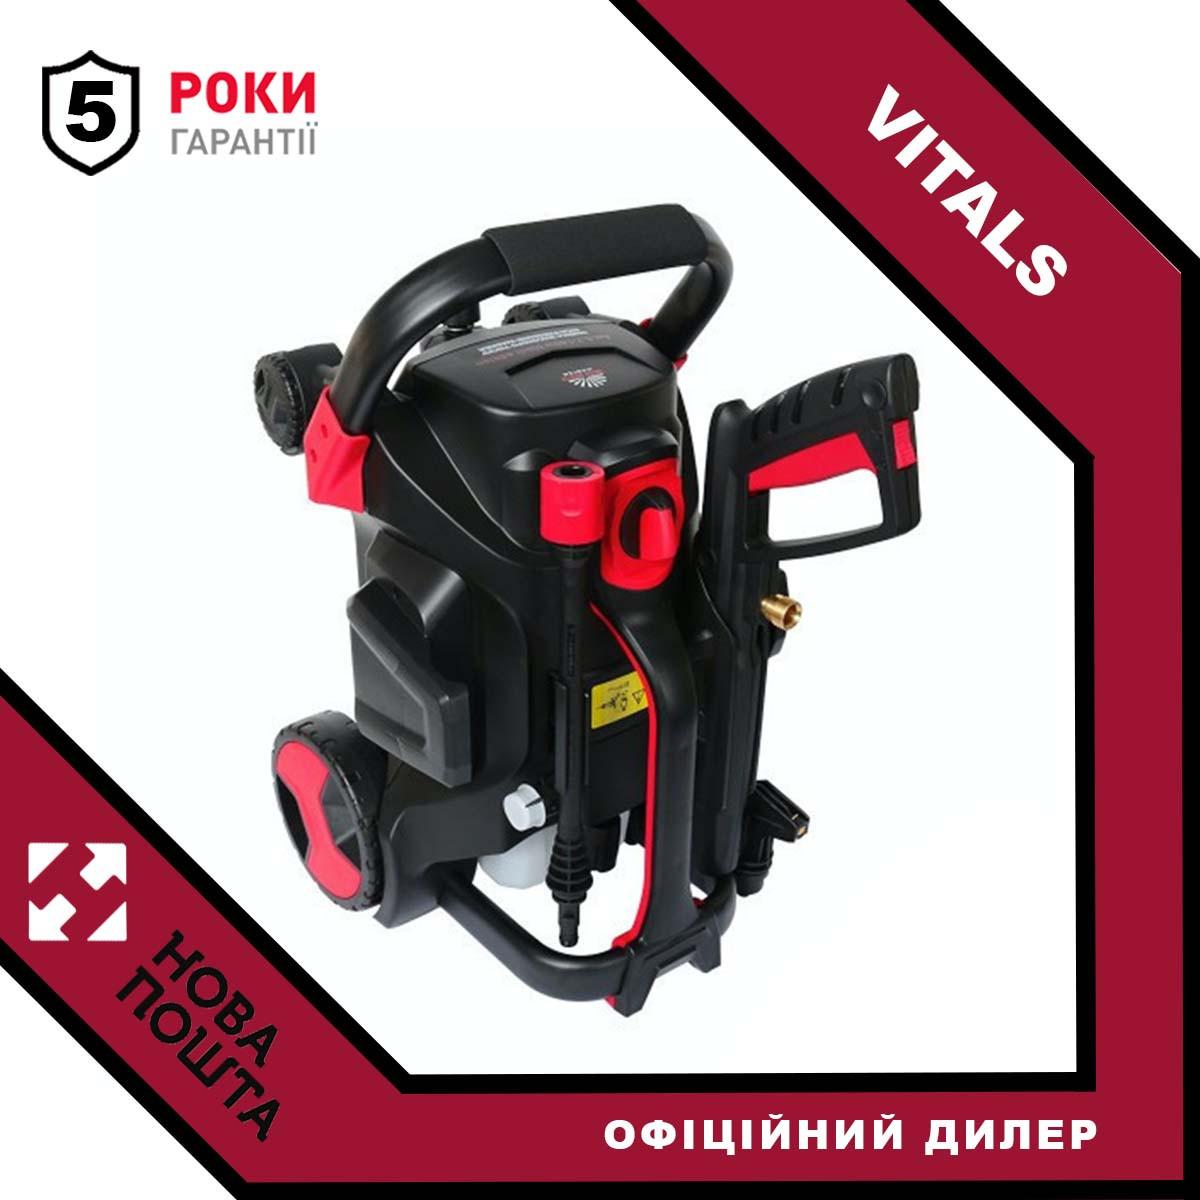 Мийка високого тиску Vitals Master Am 6.7-140w black edition